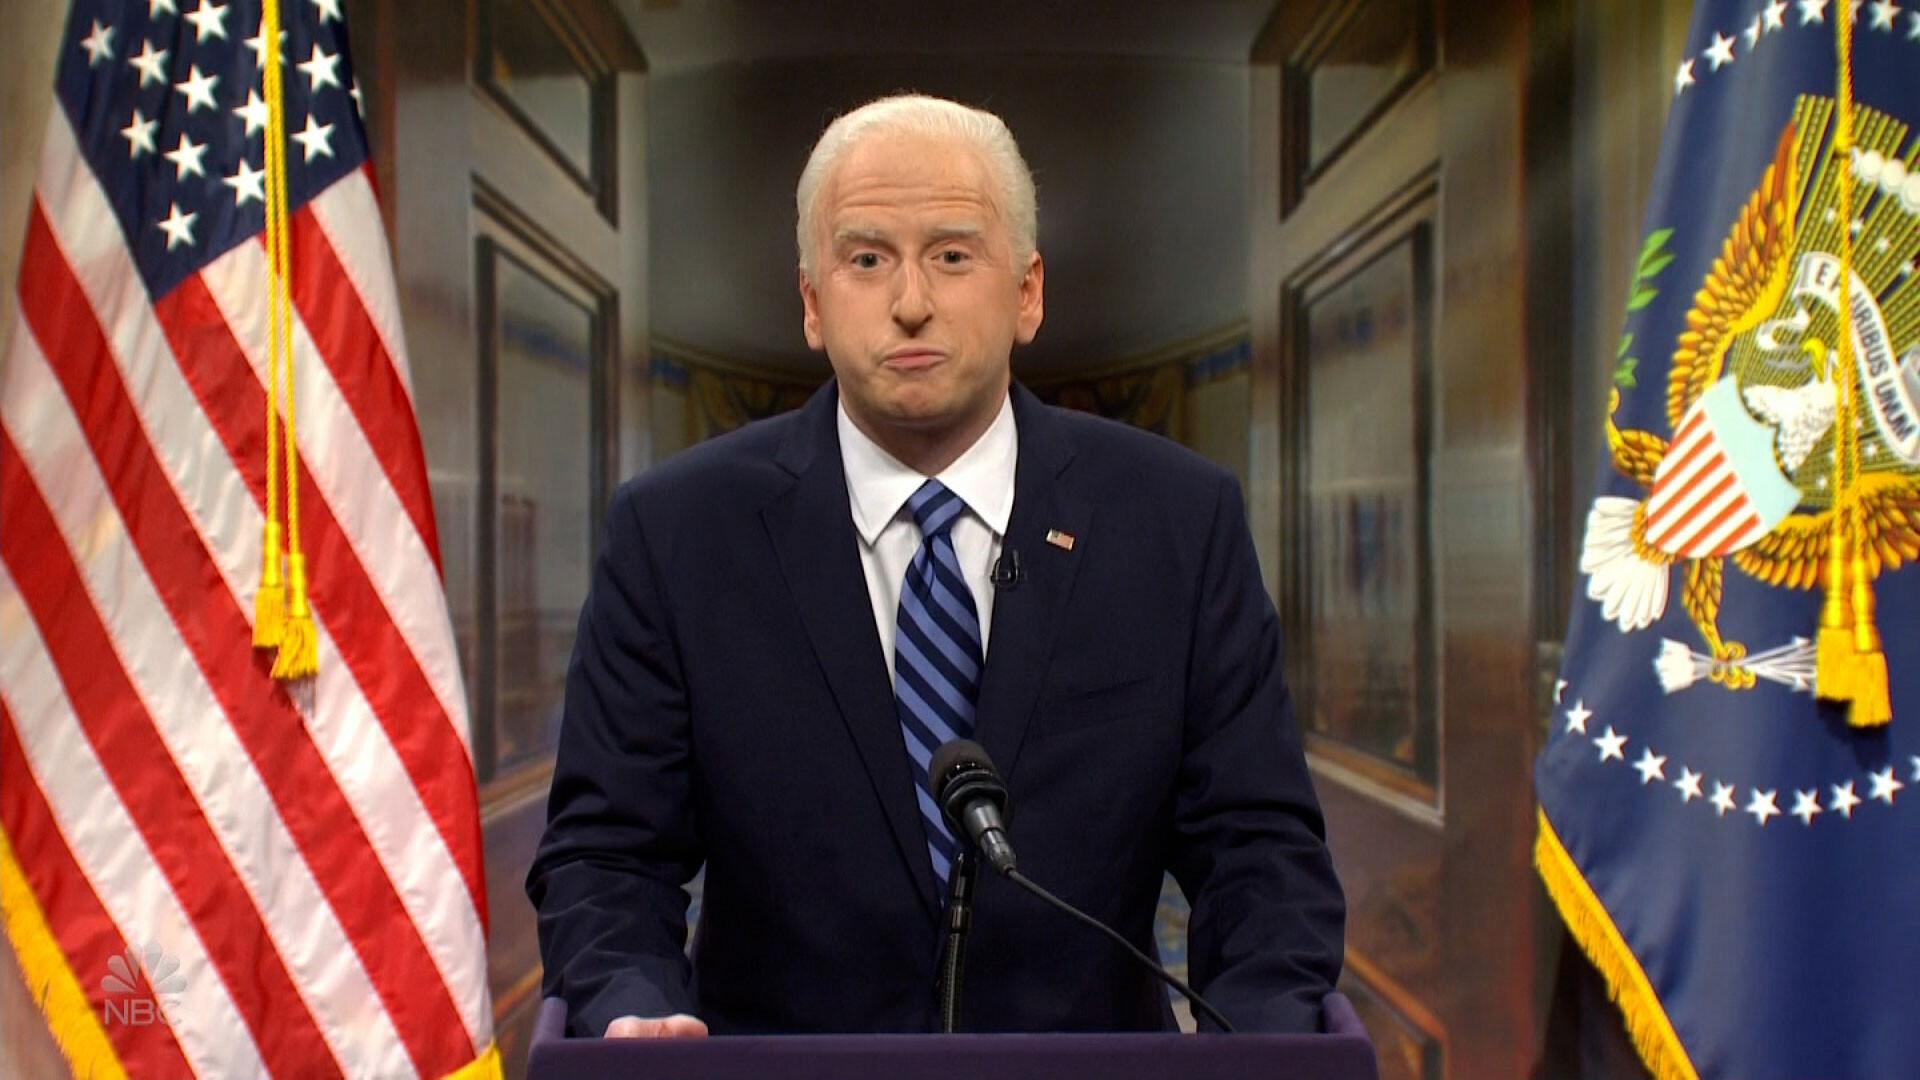 'SNL' returns with a new Joe Biden, looking to unite Democrats